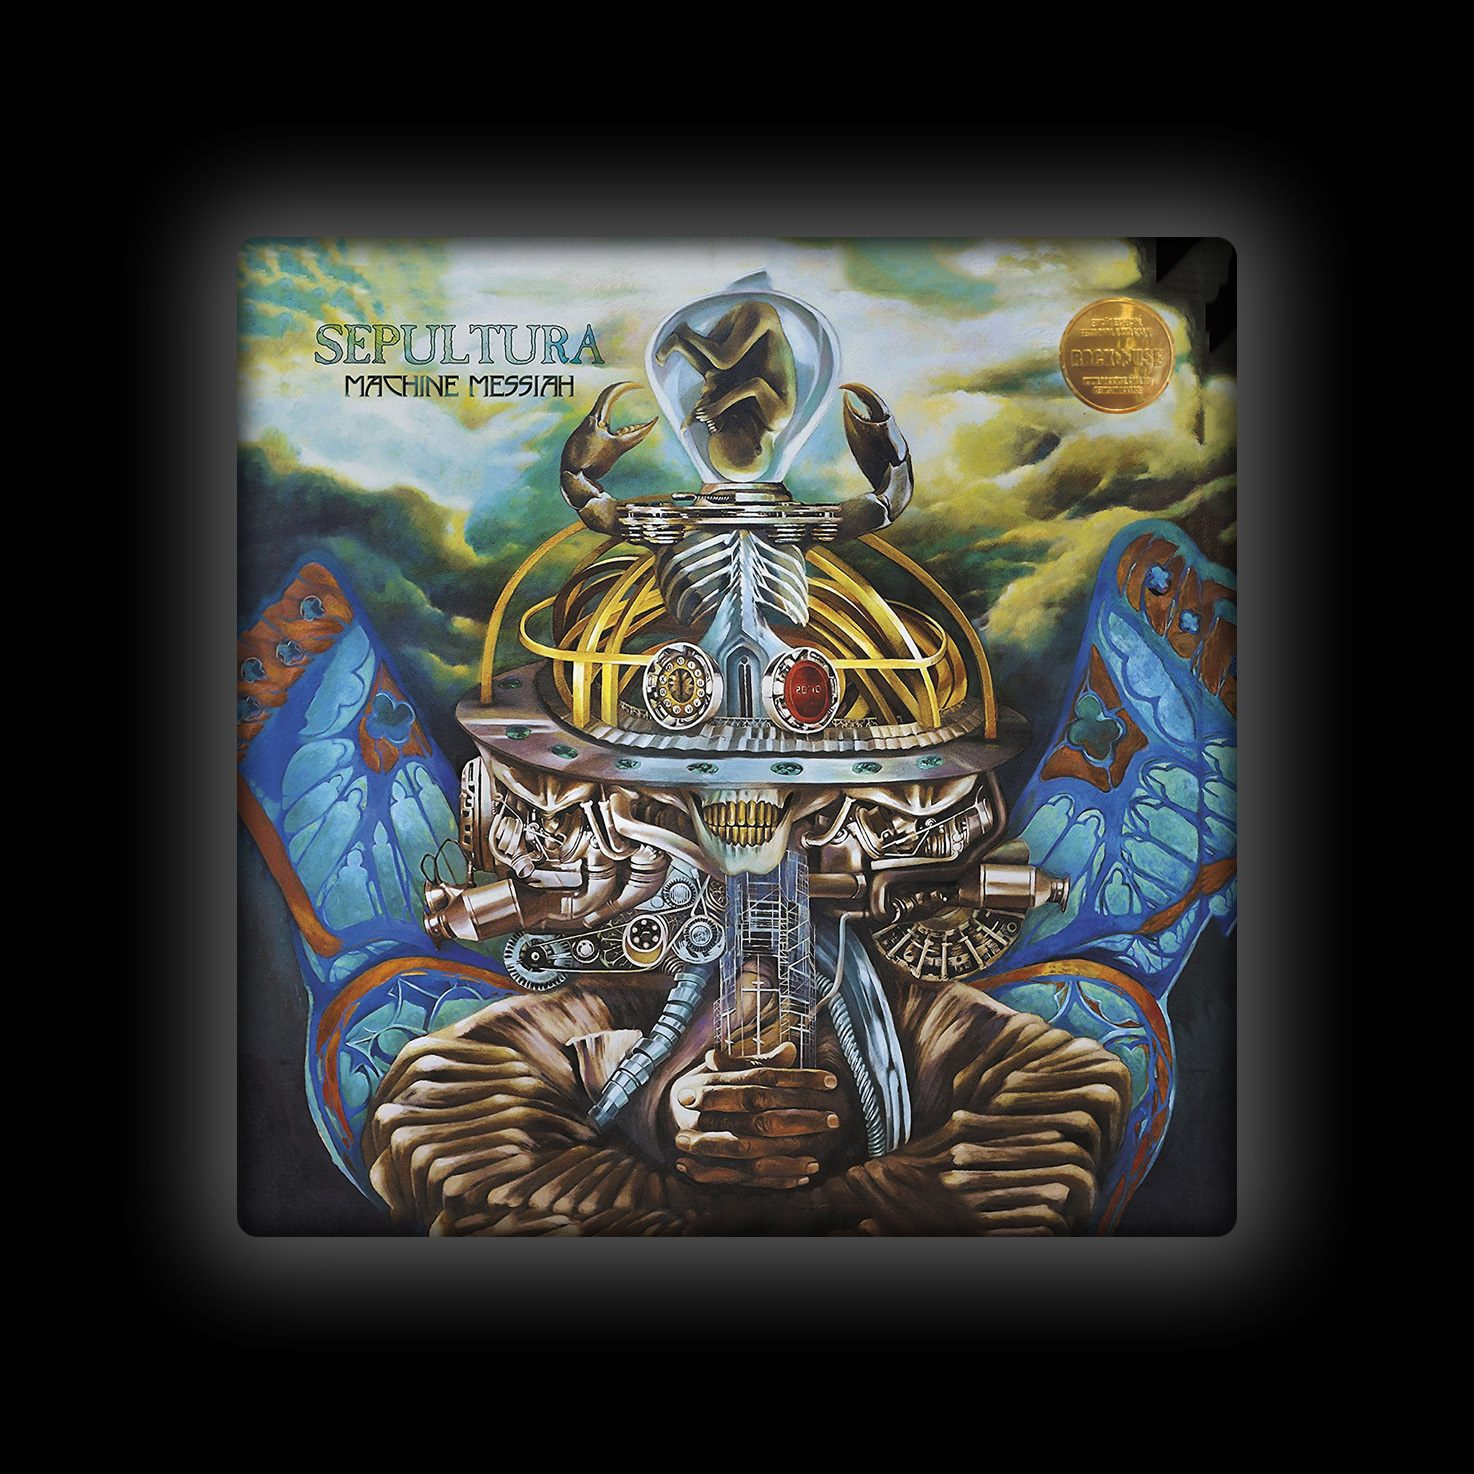 Capa de Almofada Sepultura - Machine Messiah